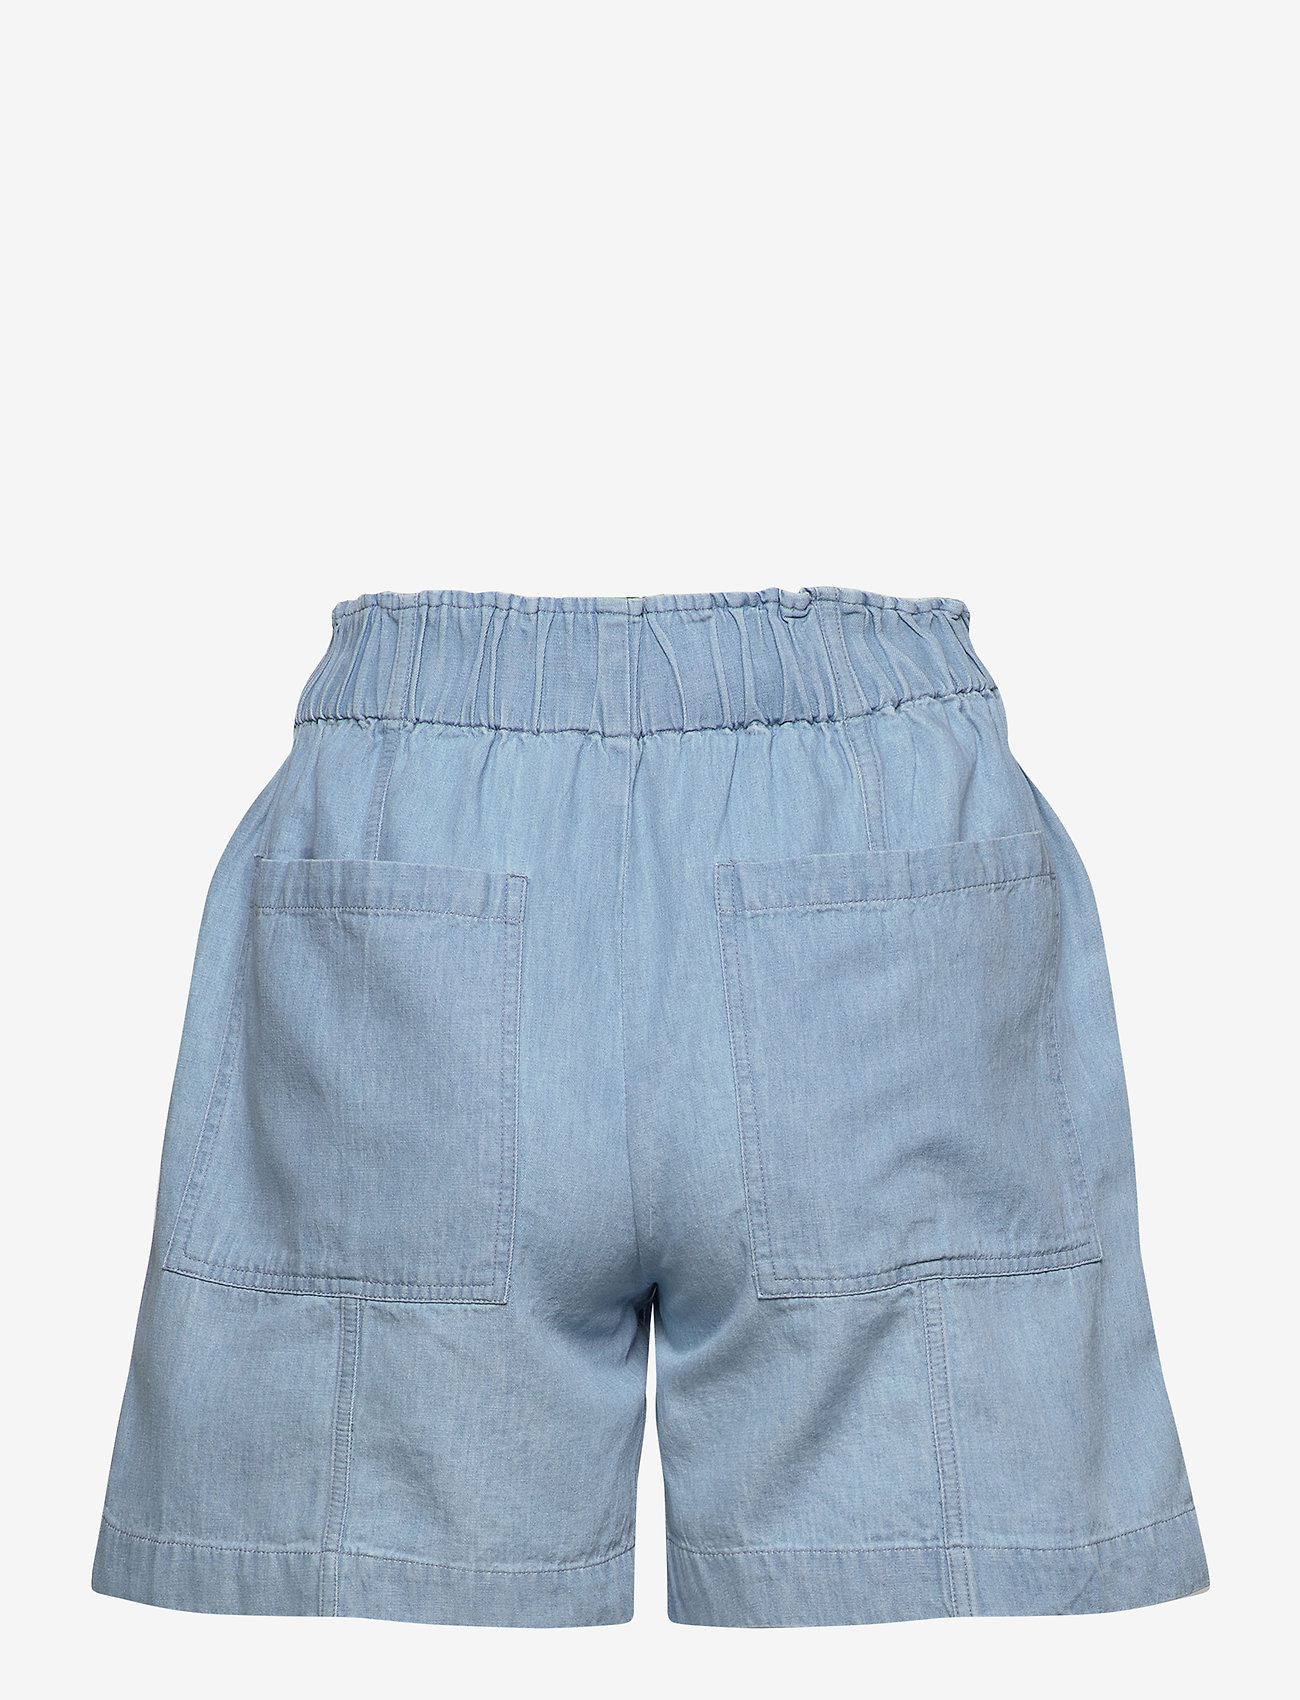 Selected Femme - SLFNOVO MW SHORTS W - korte jeansbroeken - light blue - 1